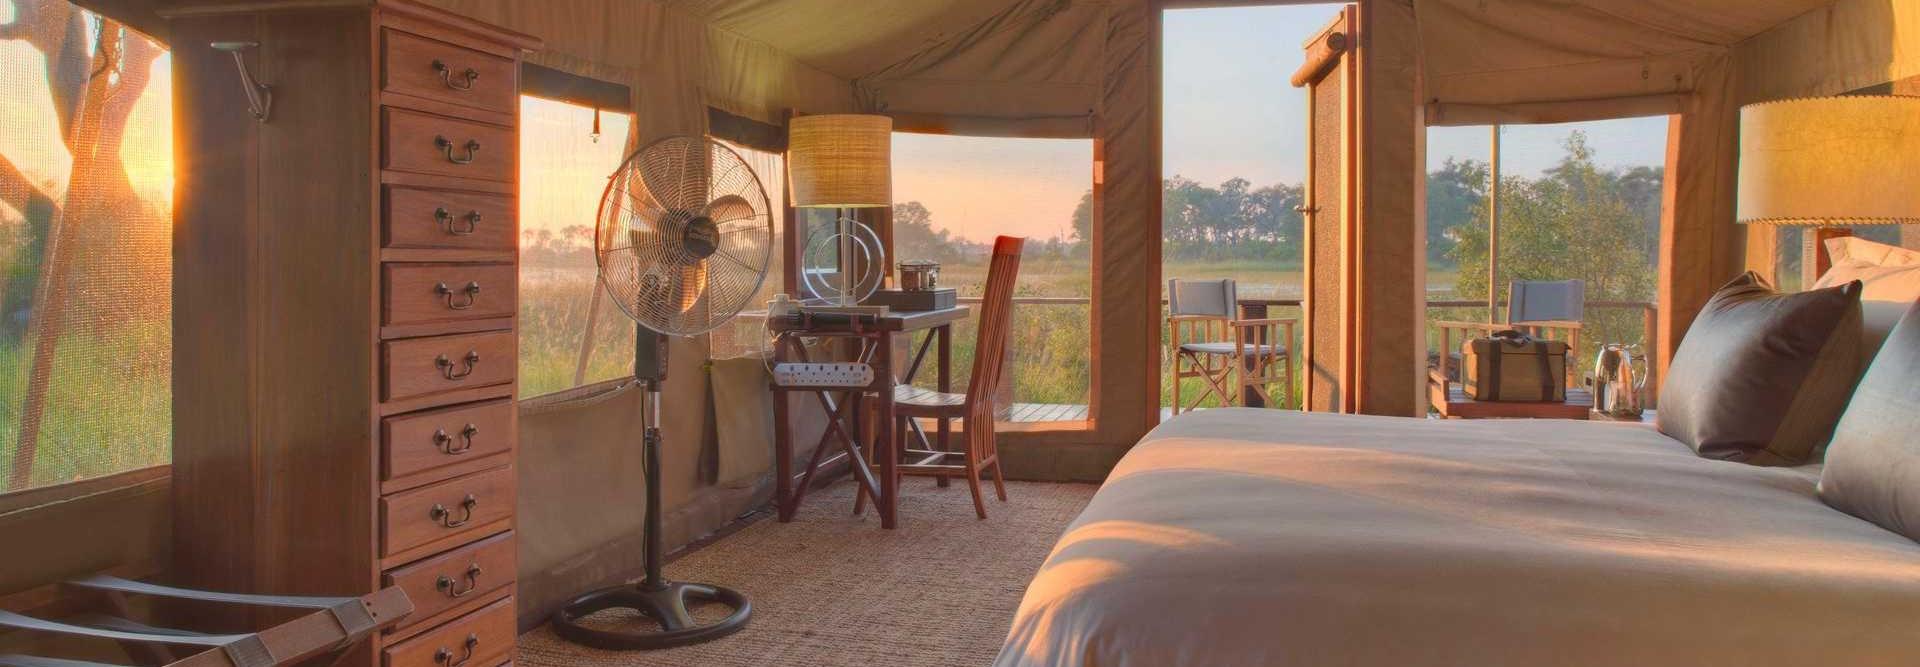 nxabega-okavango-tented-camp-6